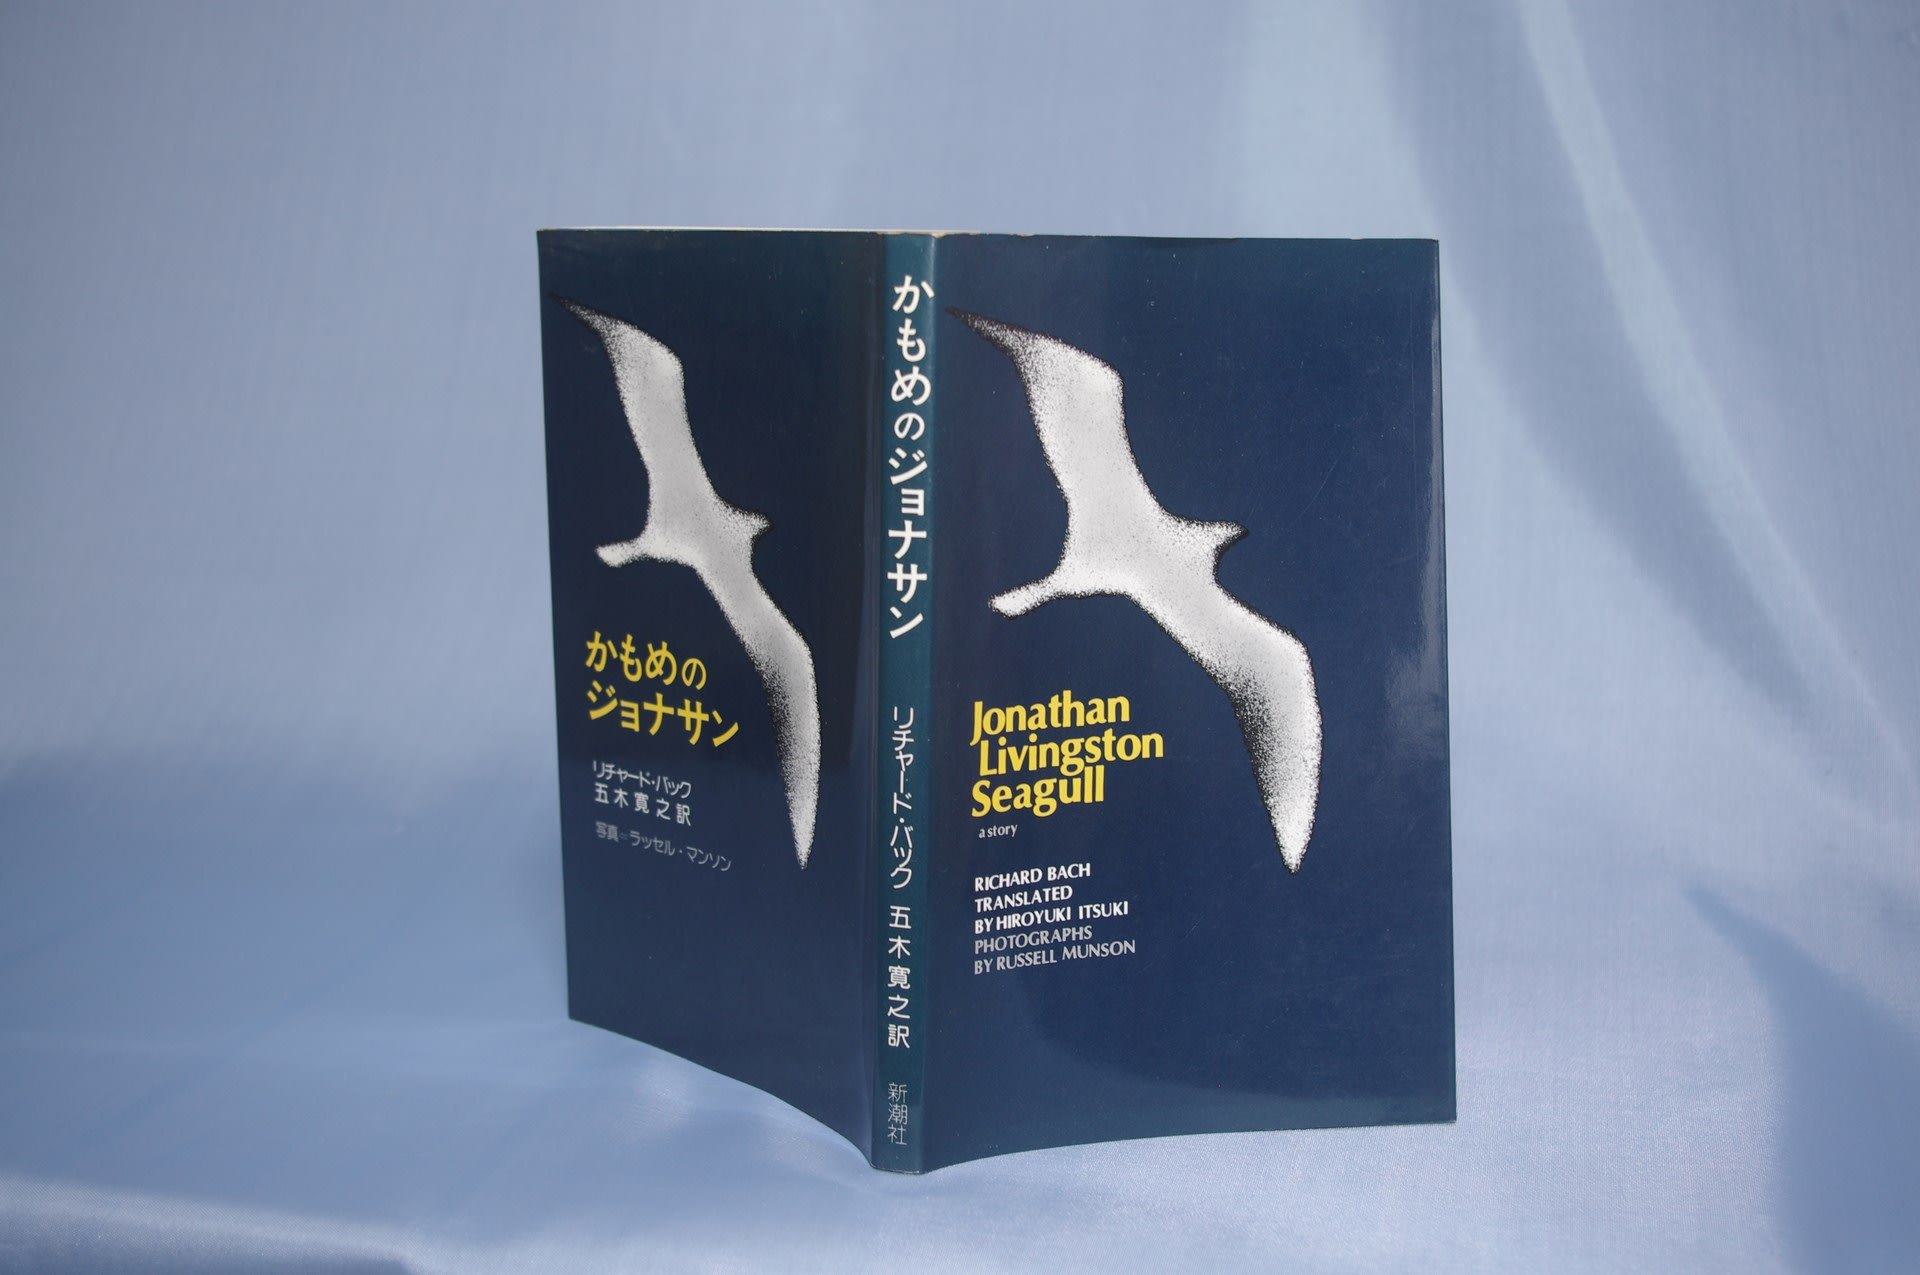 03_Jonathan Livingston Seagull